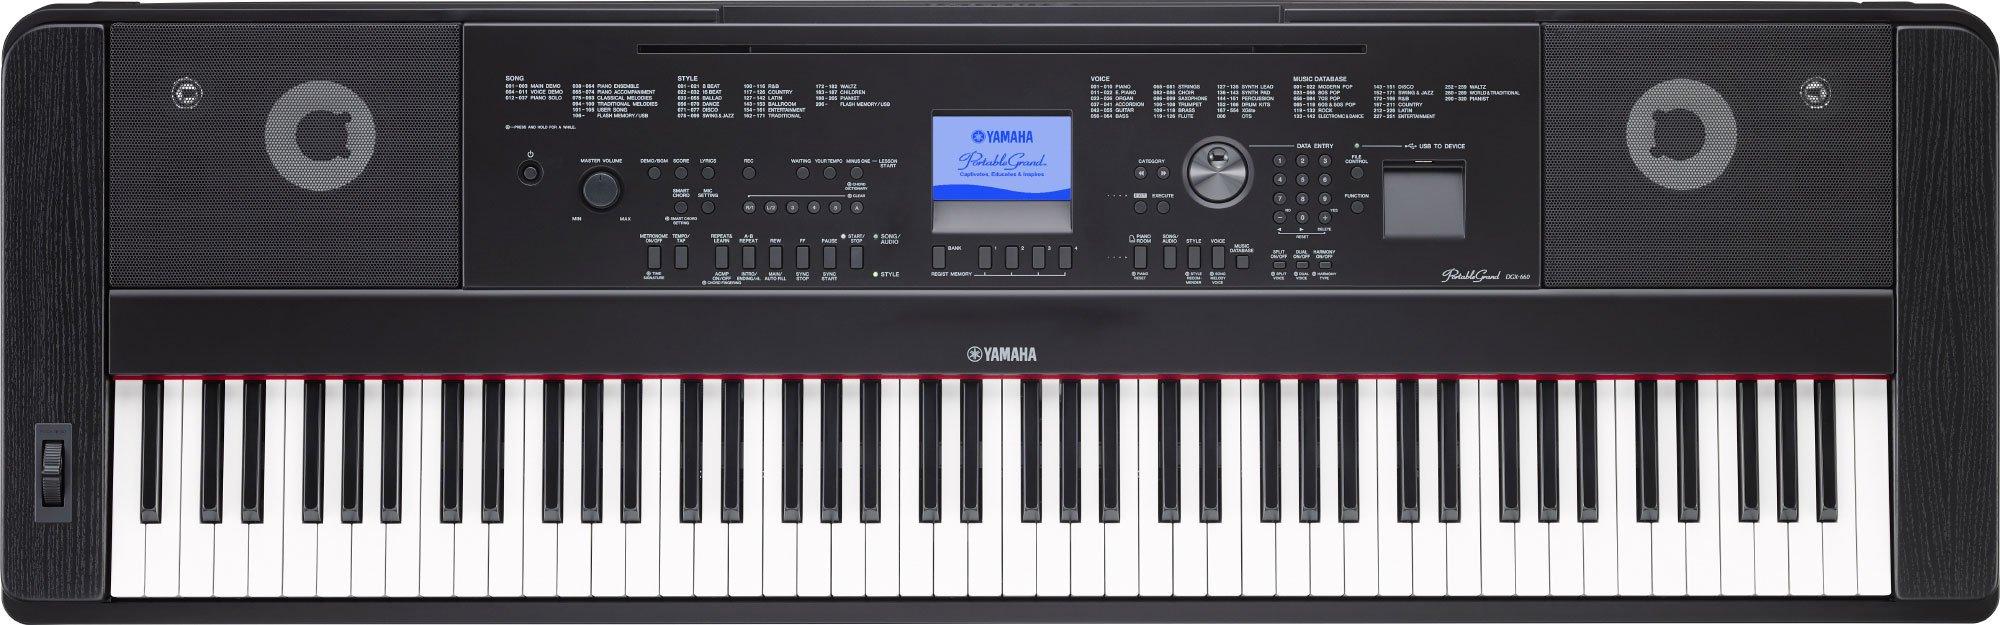 Casio PX 560 Vs Yamaha DGX 660